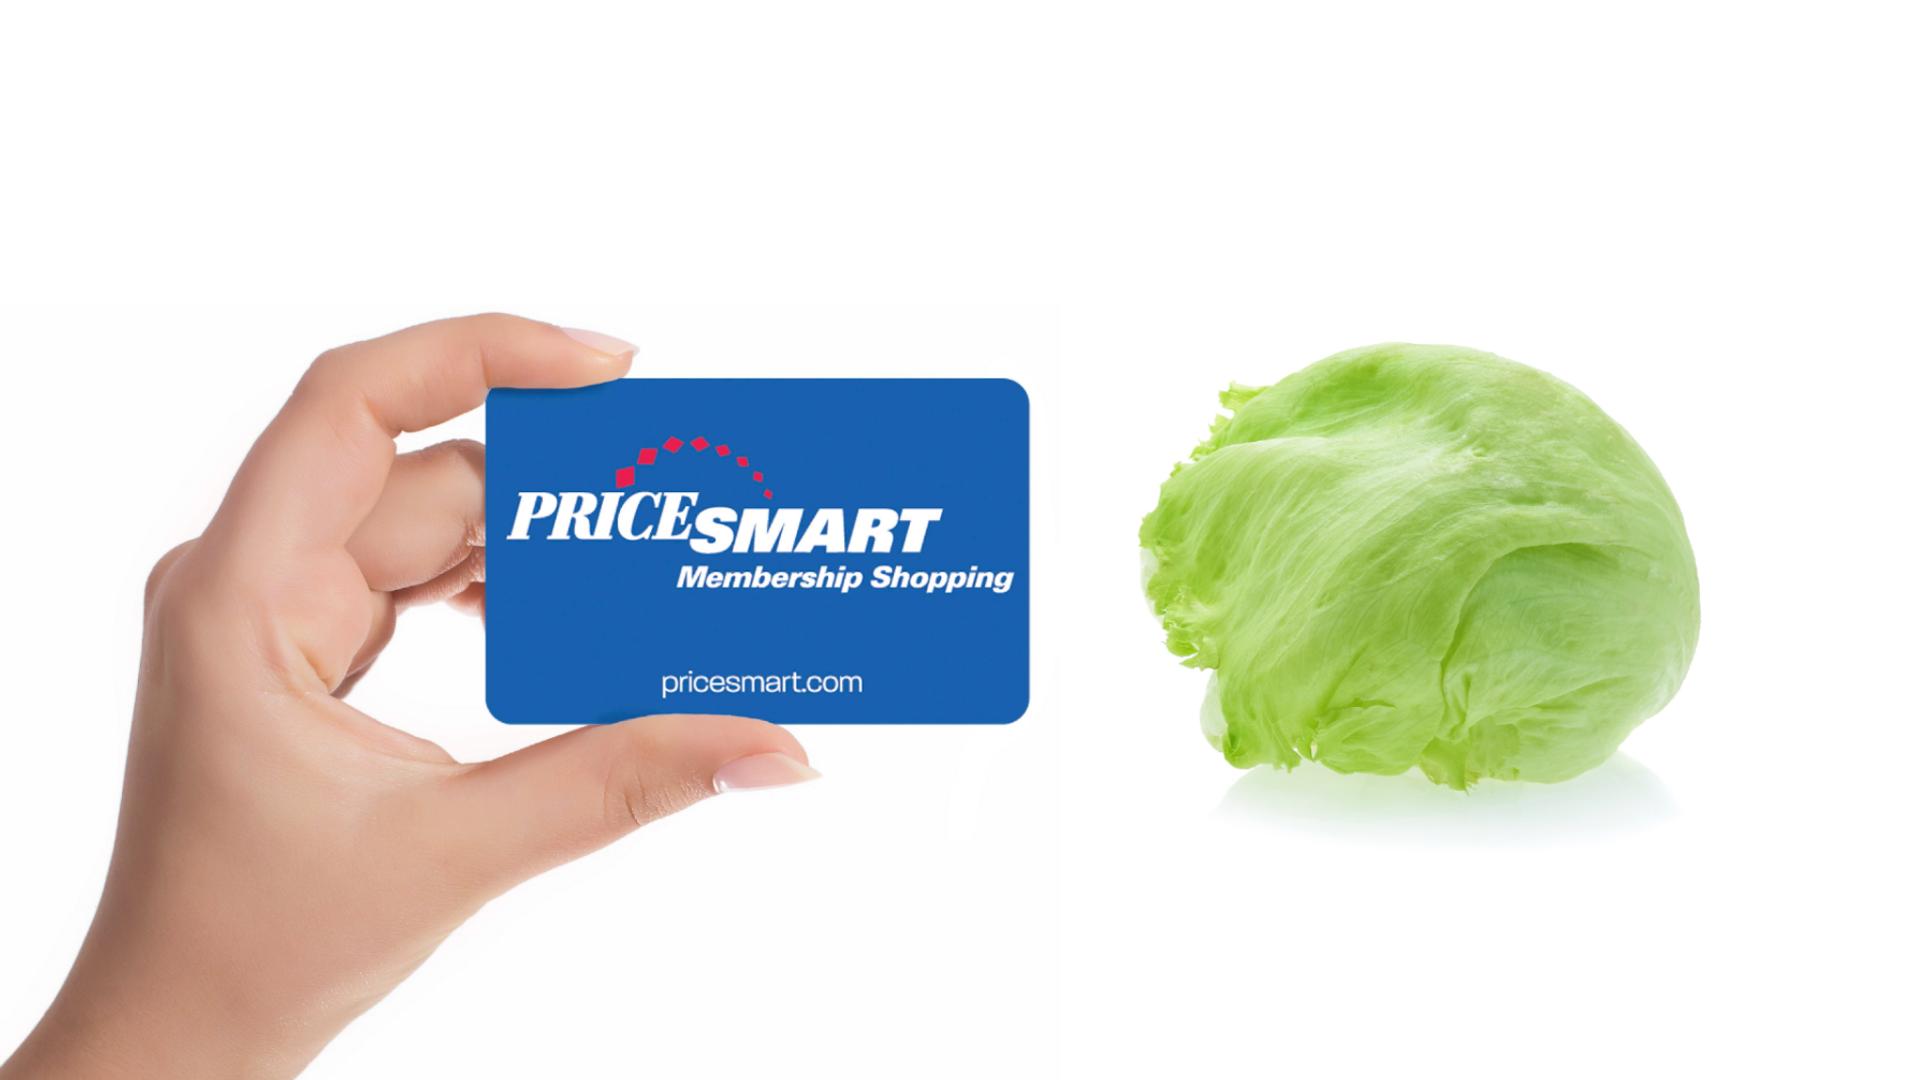 PriceSmart Campaign